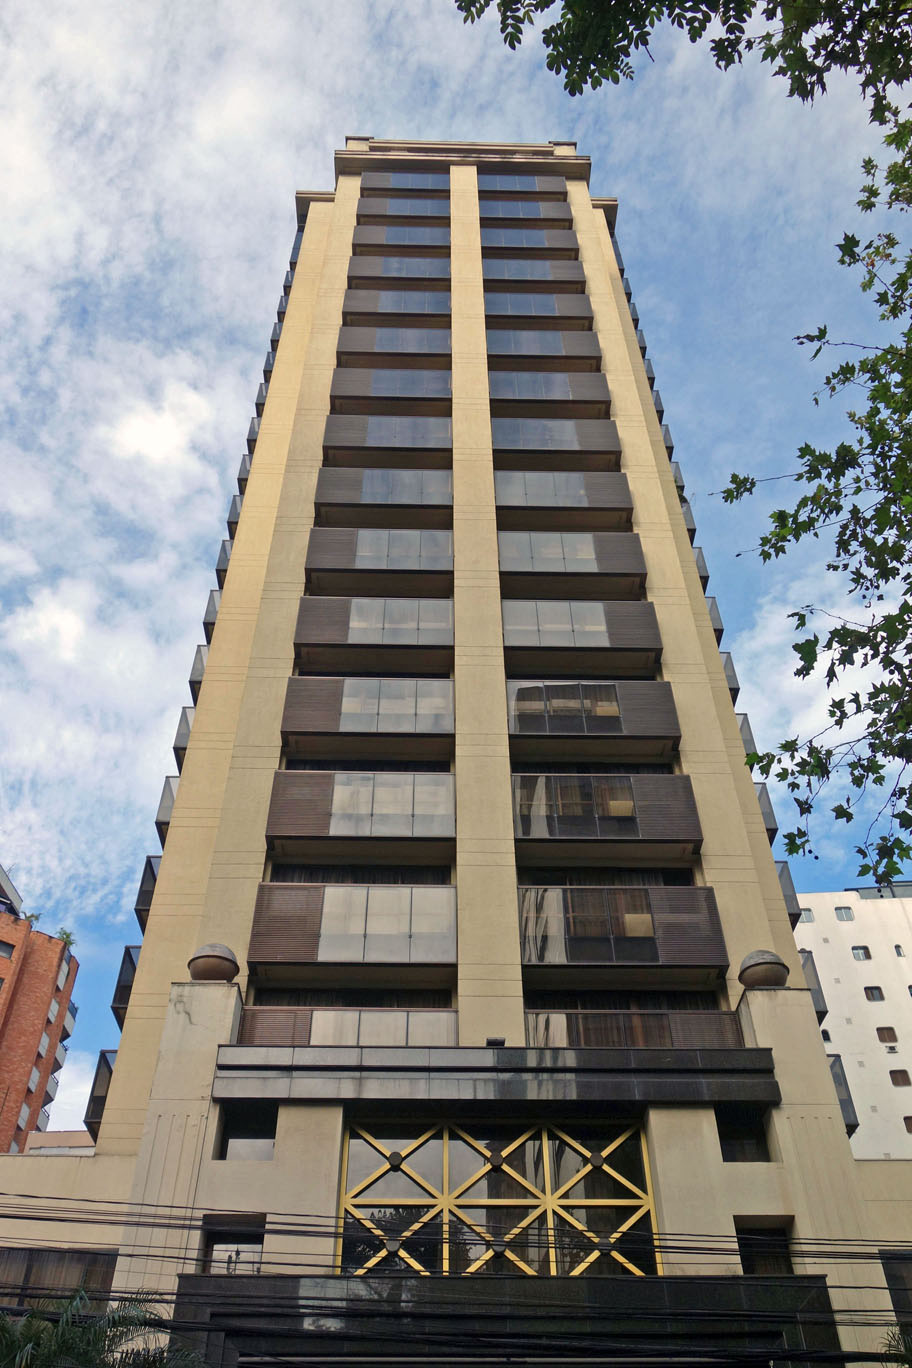 Обзор: DoubleTree by Hilton Itaim, Сан-Паулу